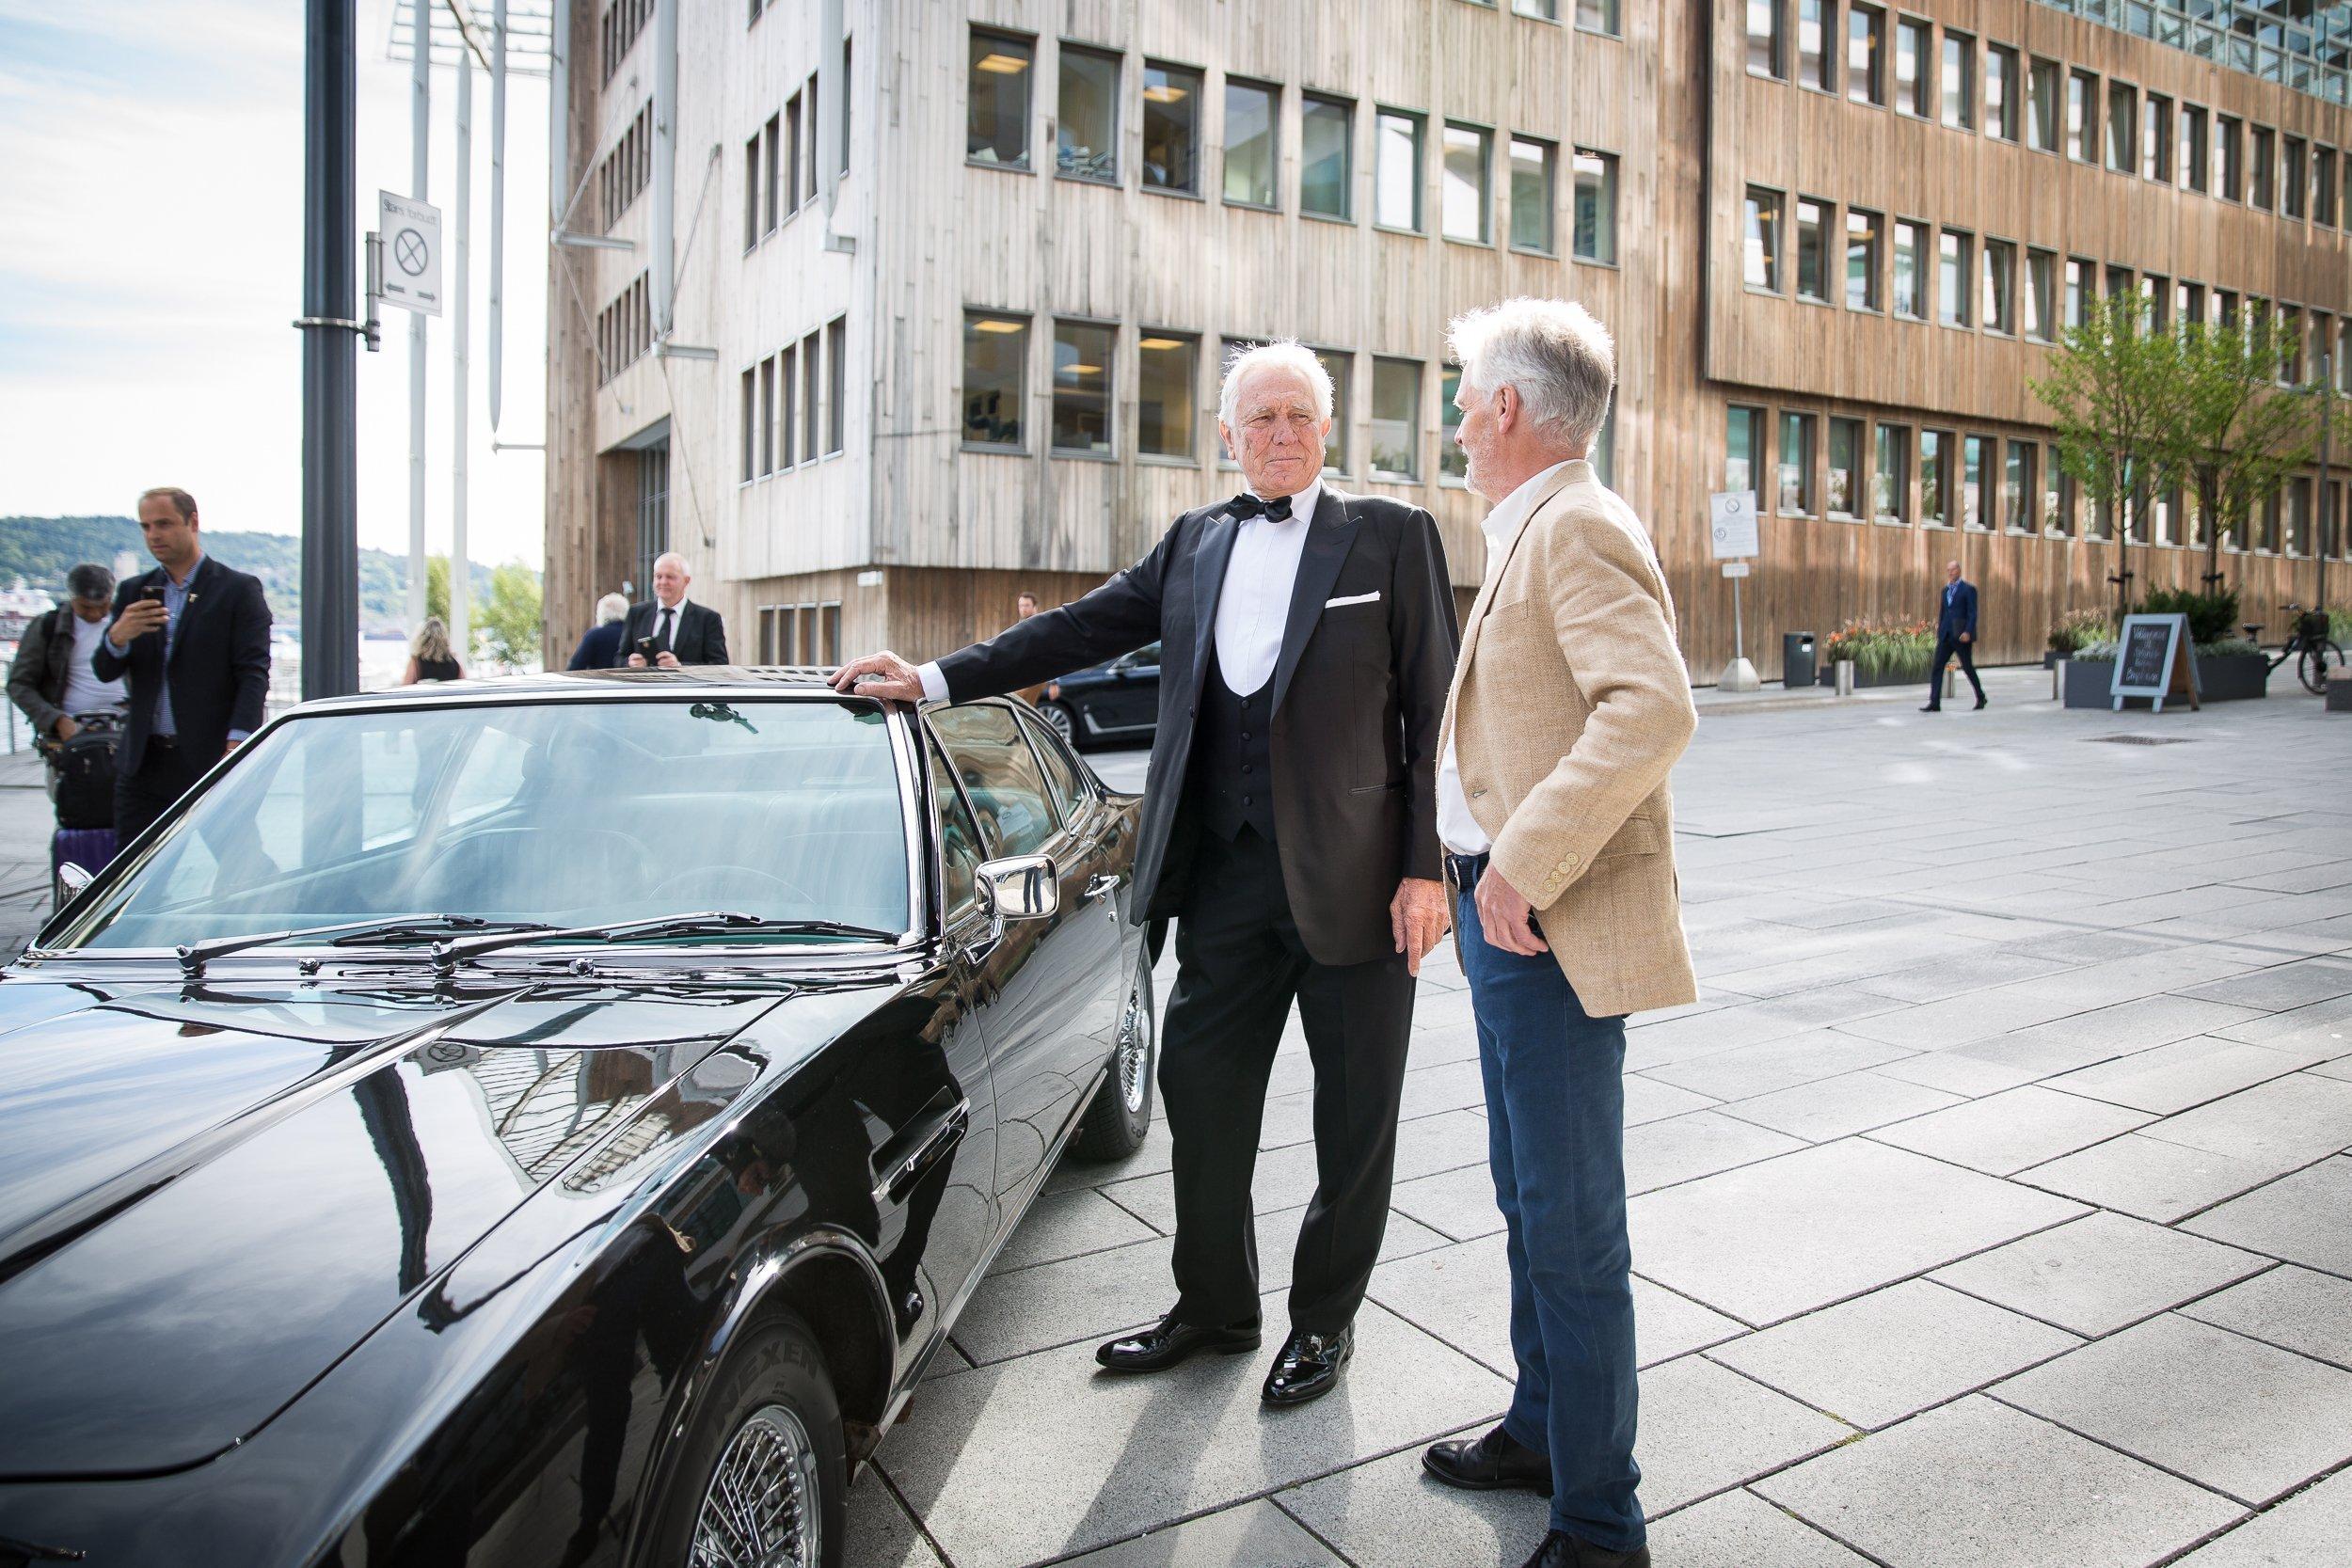 James-Bond-Oslo-George-Lazenby-Aston-Martin